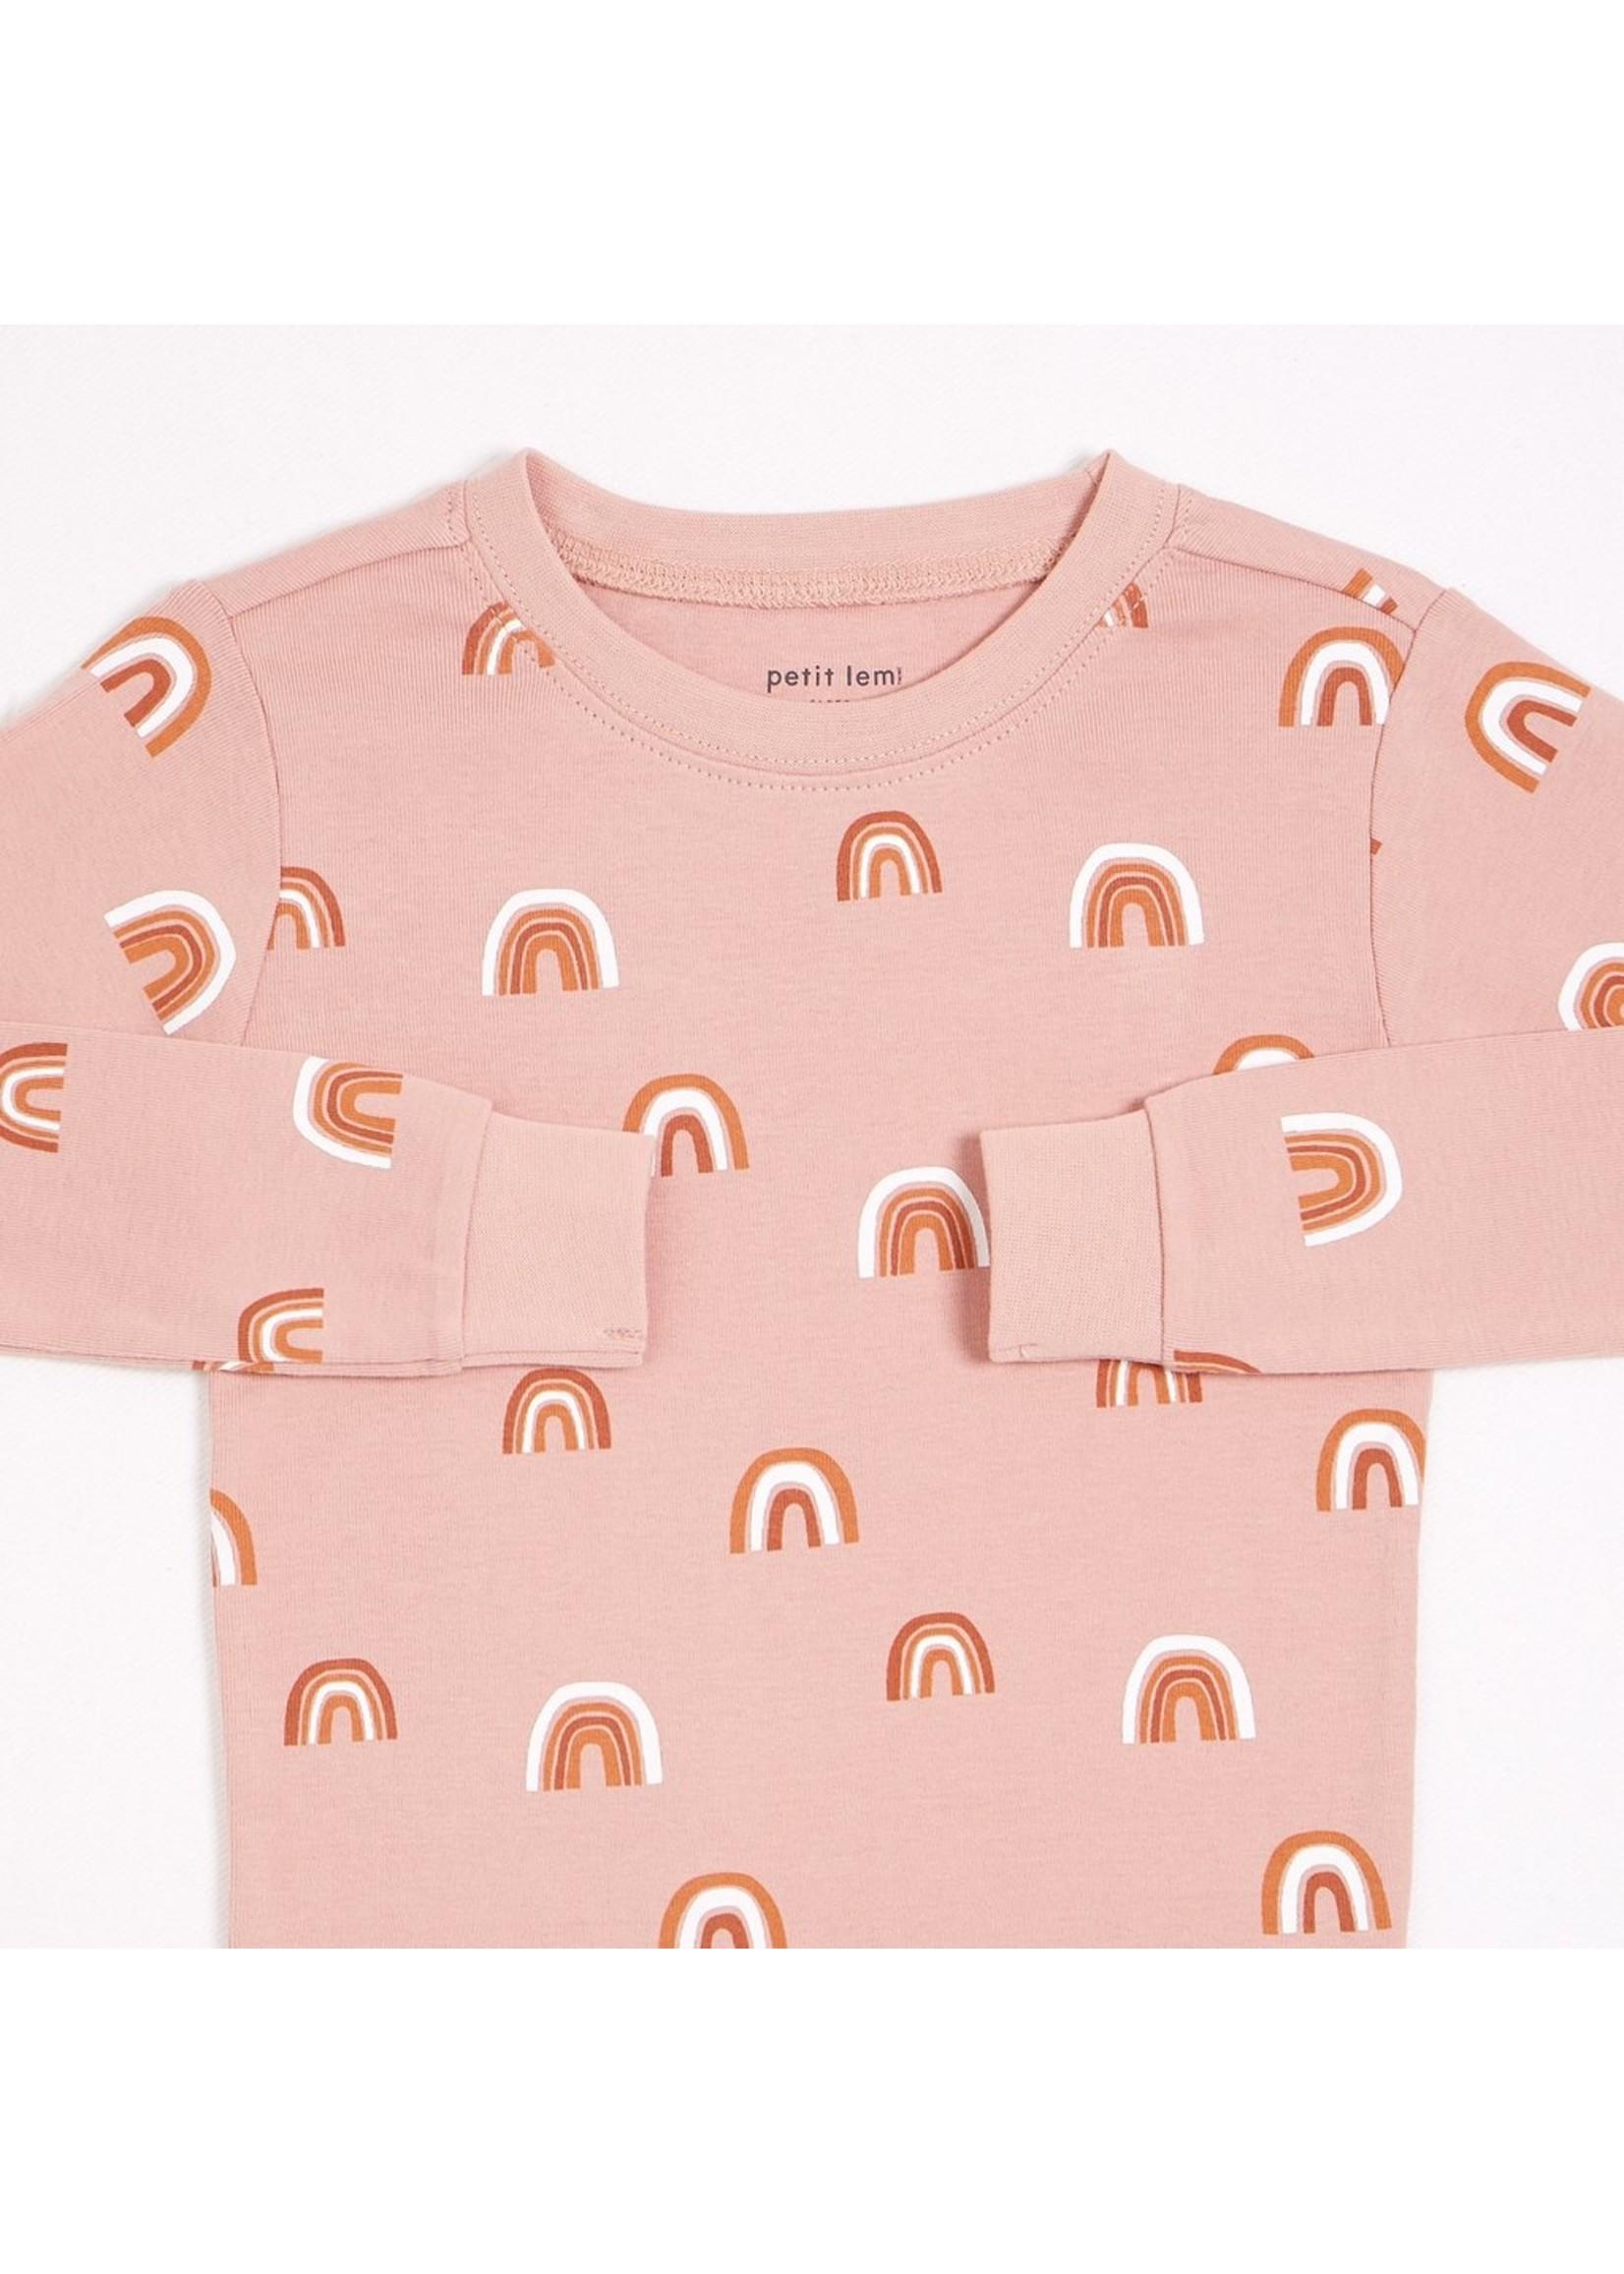 Petit Lem Pyjama 2 pièces Arc-en-Ciel